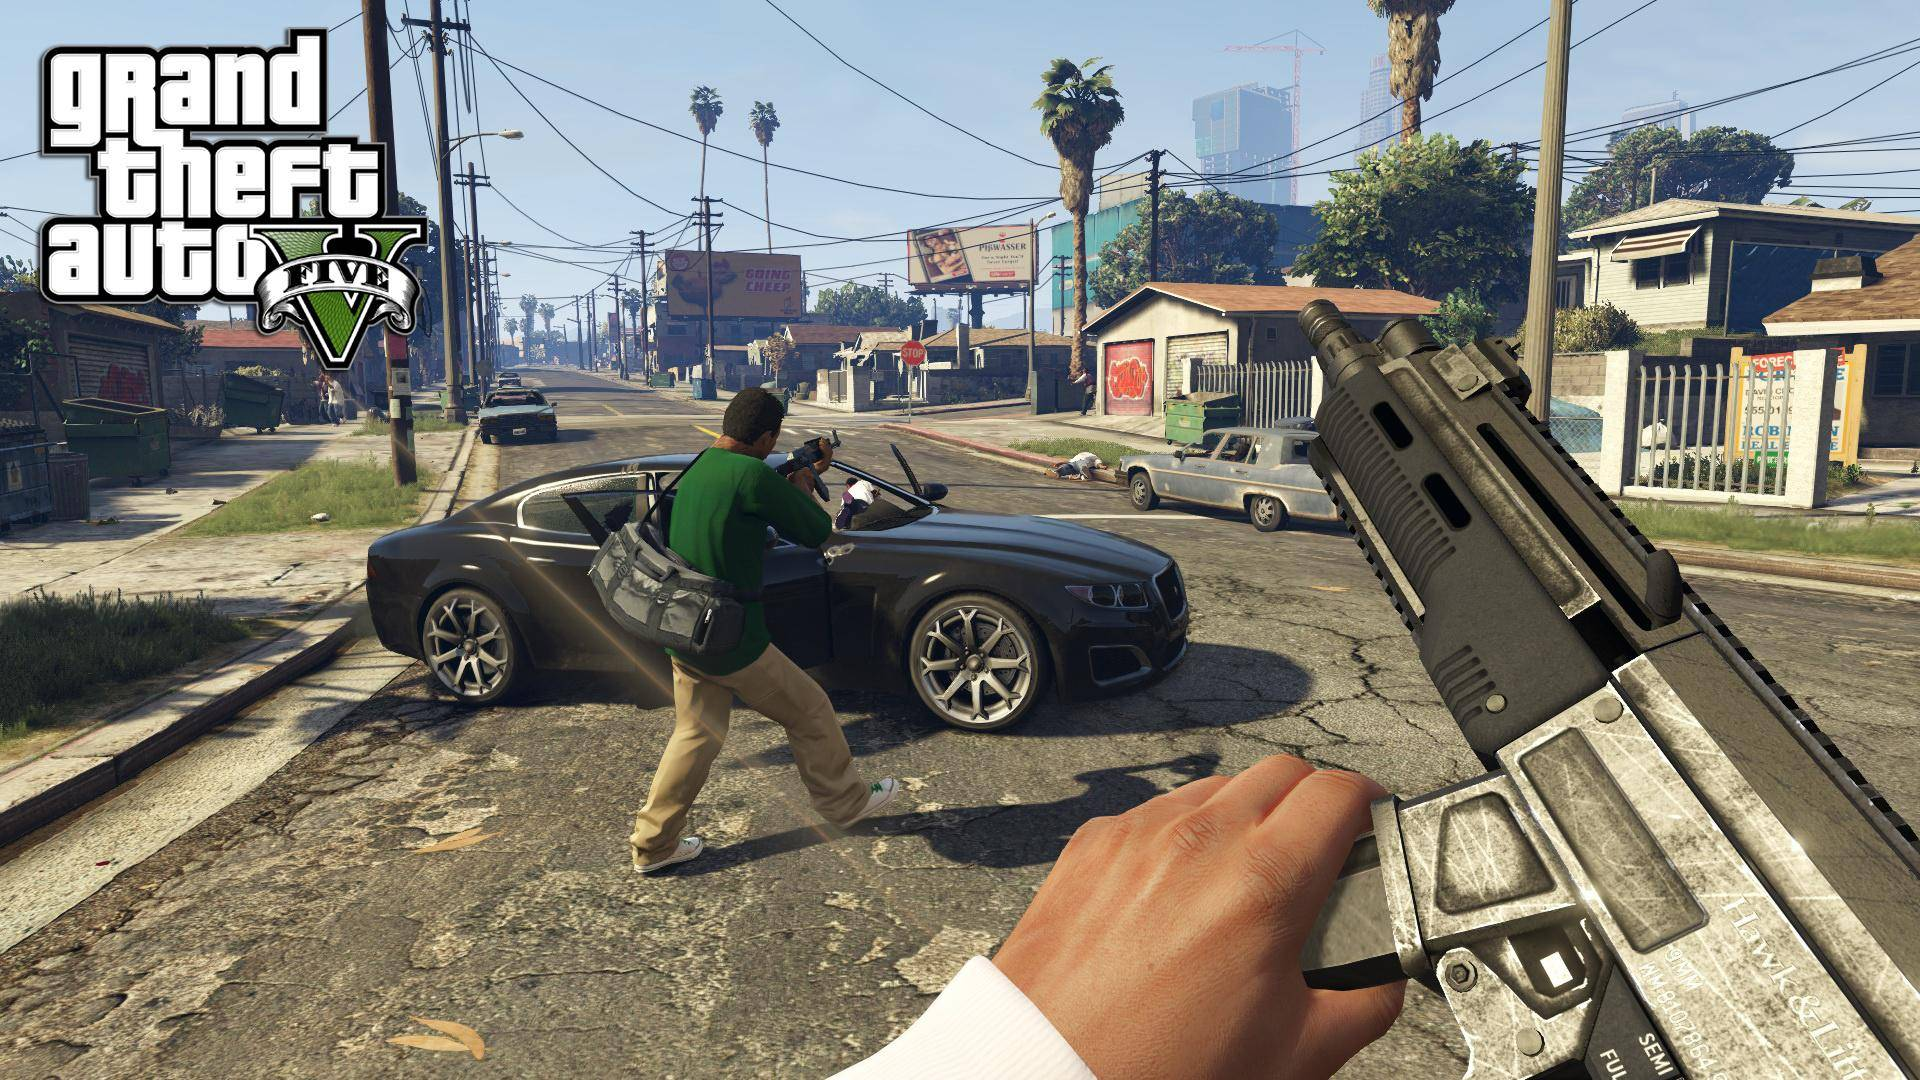 buy gta 5 grand theft auto v bonus pc cd key compare prices